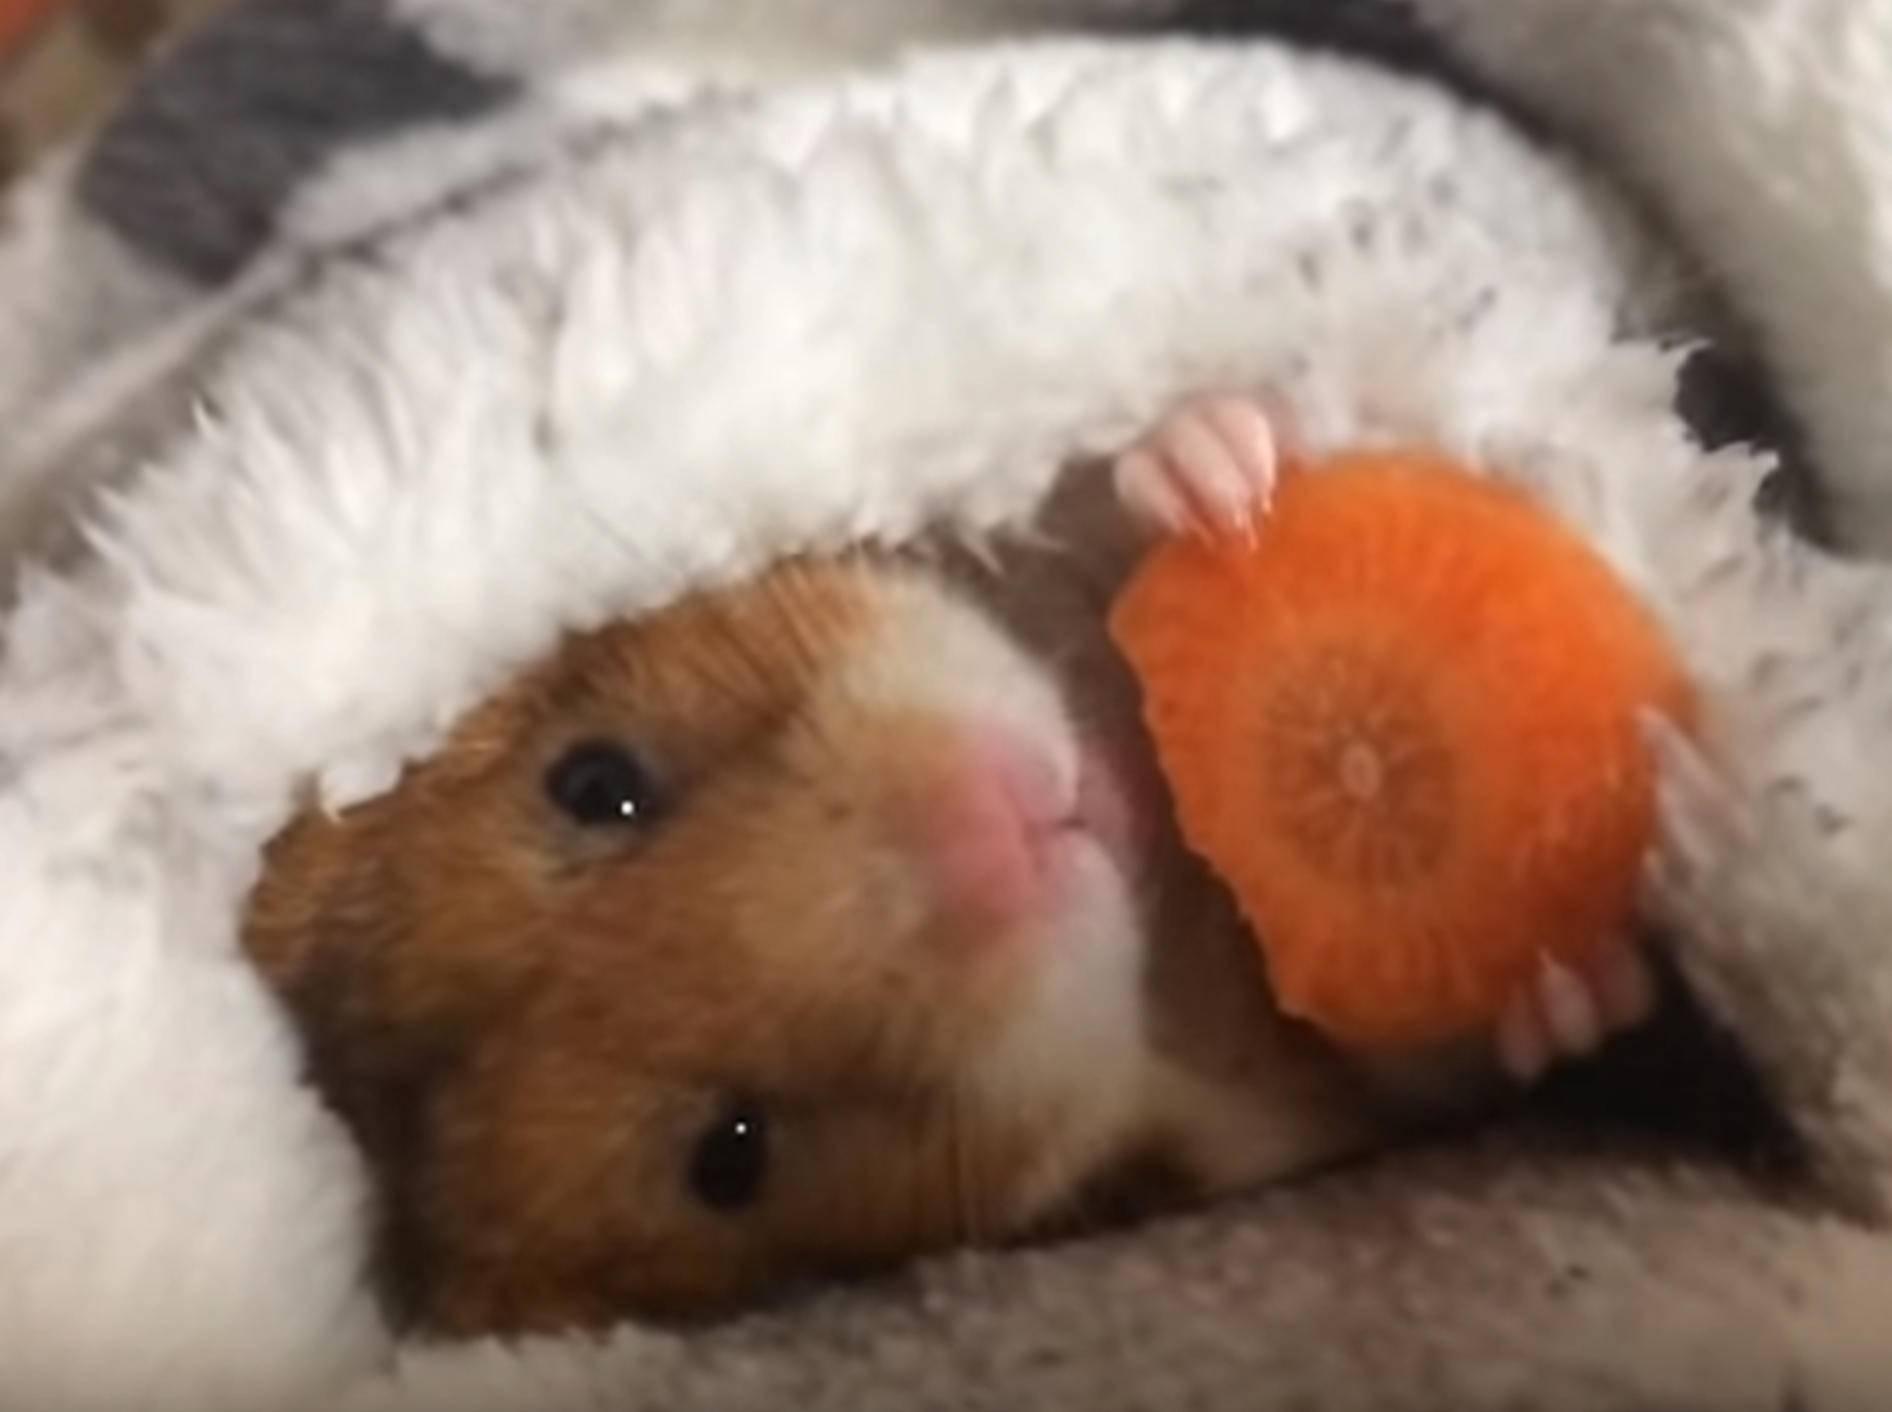 Zum Dahinschmelzen: Niedlicher Hamster futtert Karotte – Bild: YouTube / mikesanman 19